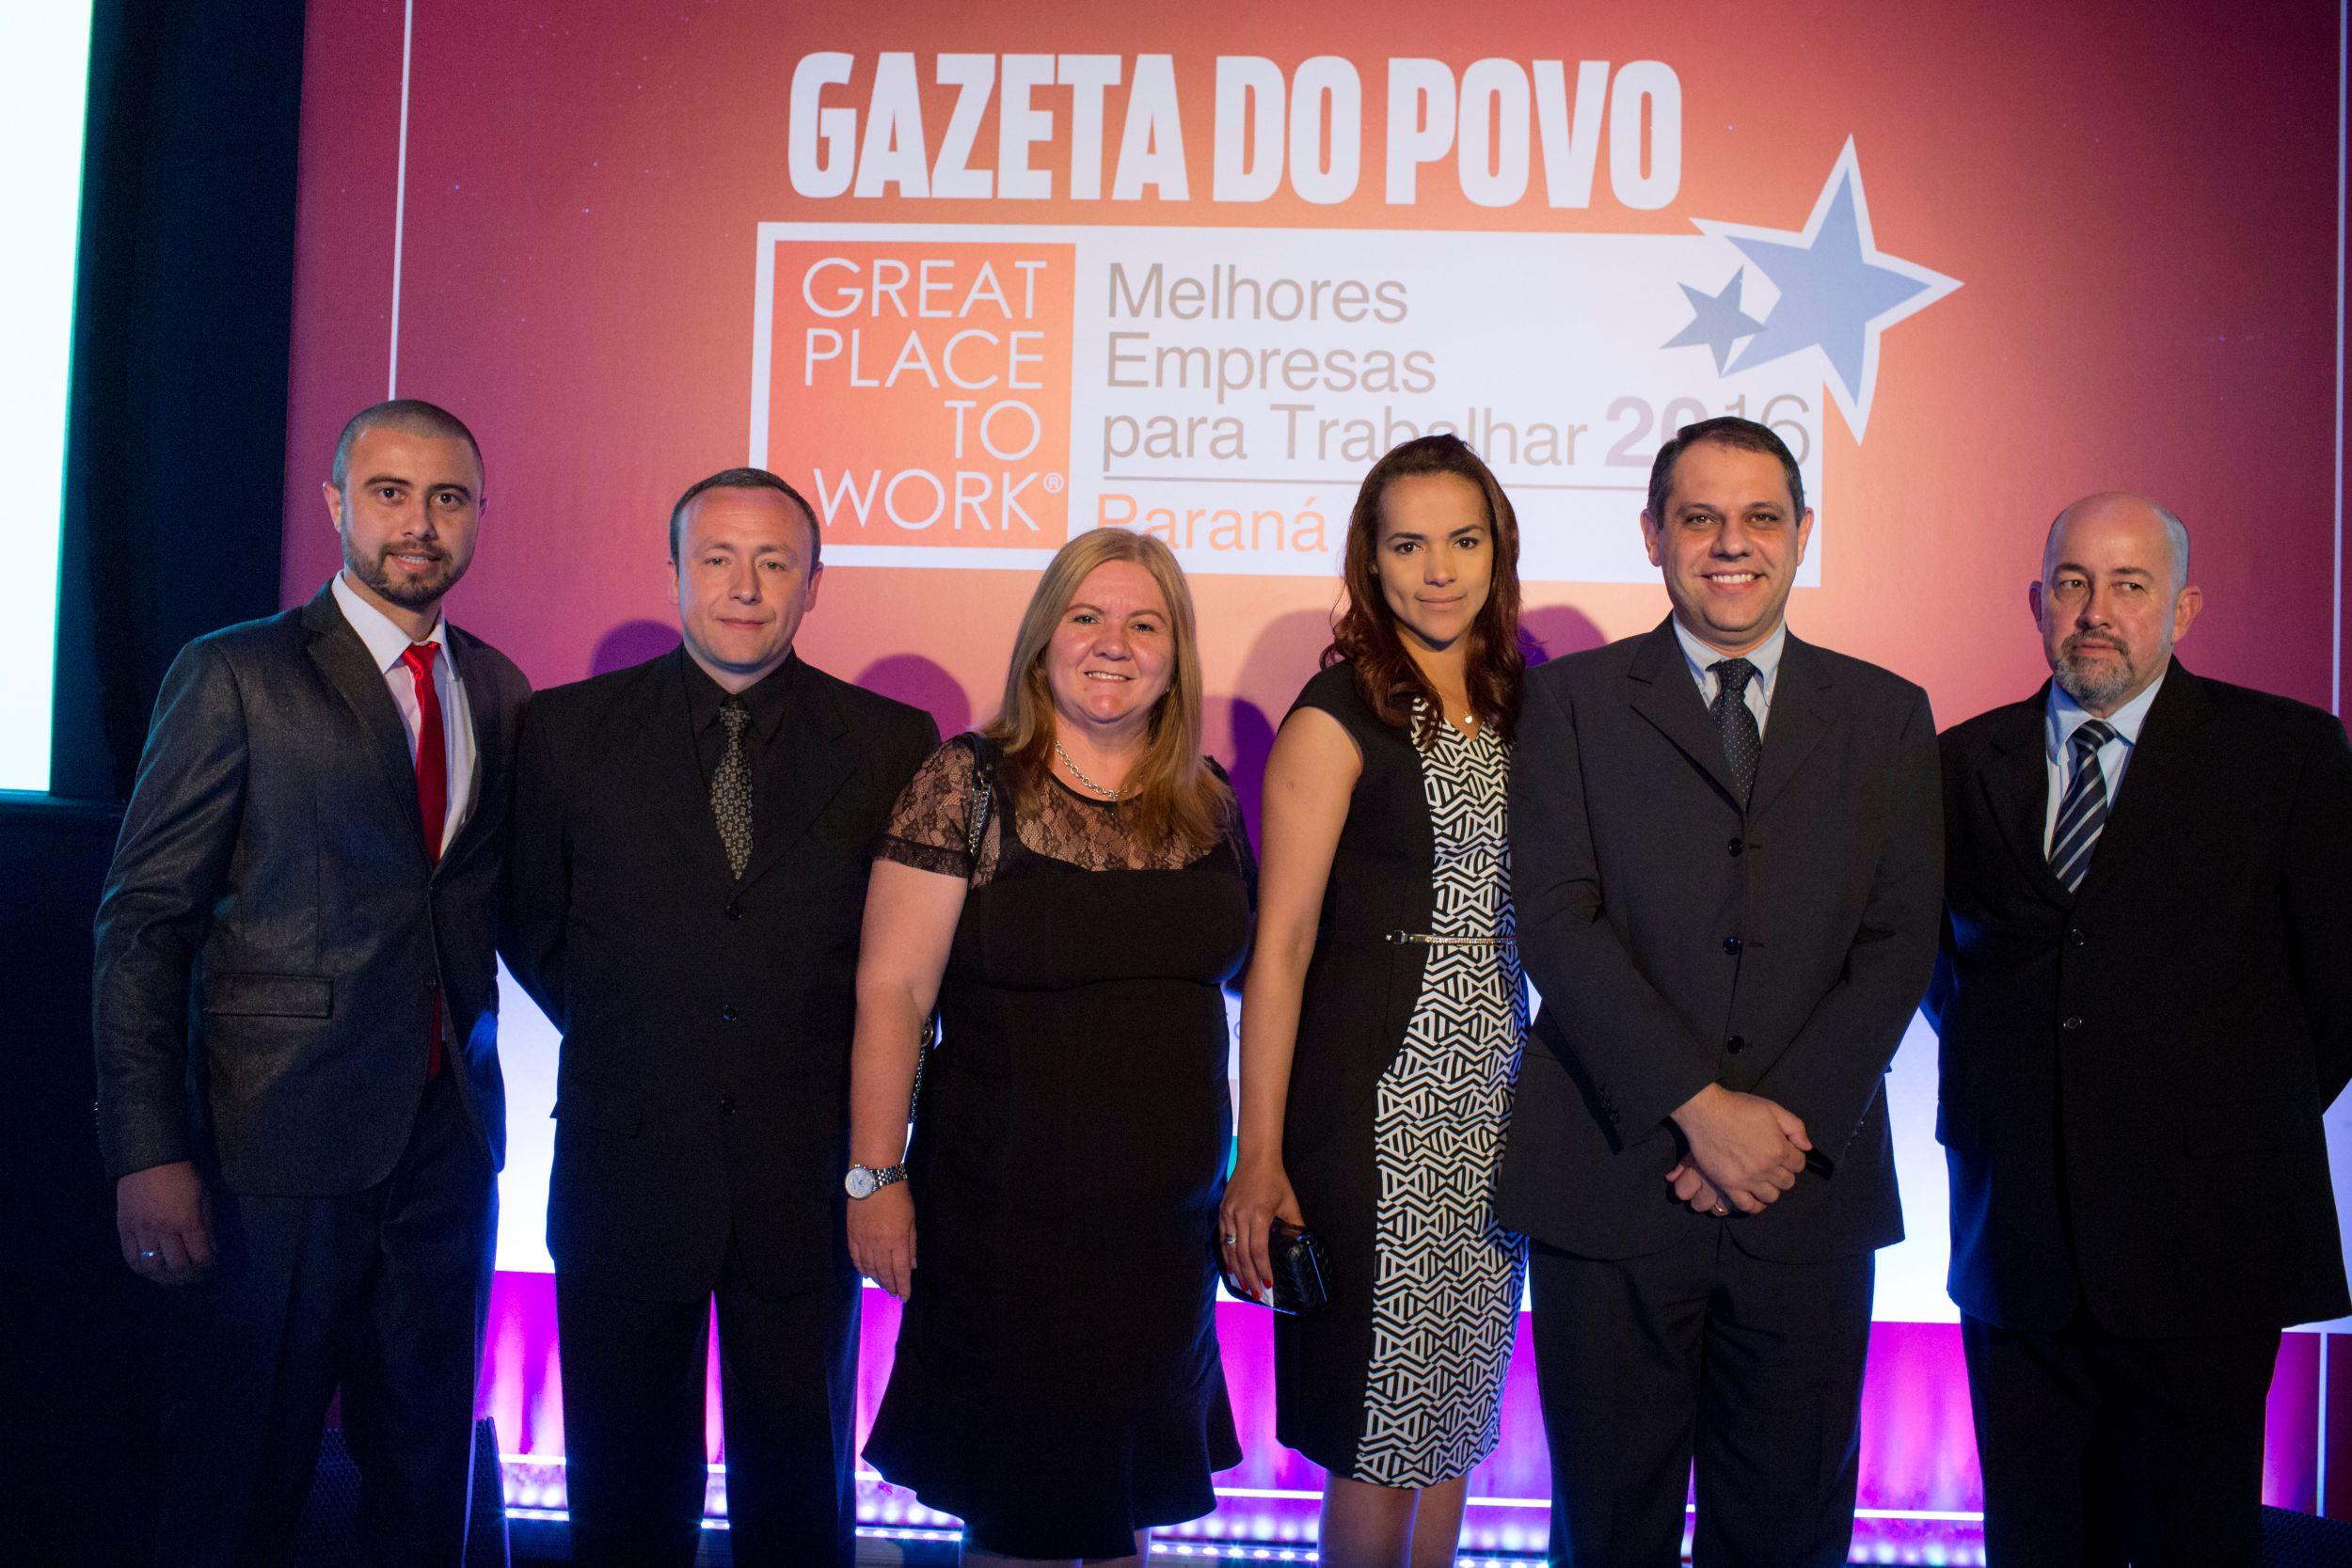 Perkins Motores do Brasil Ltda named top employer in Paraná, Brazil